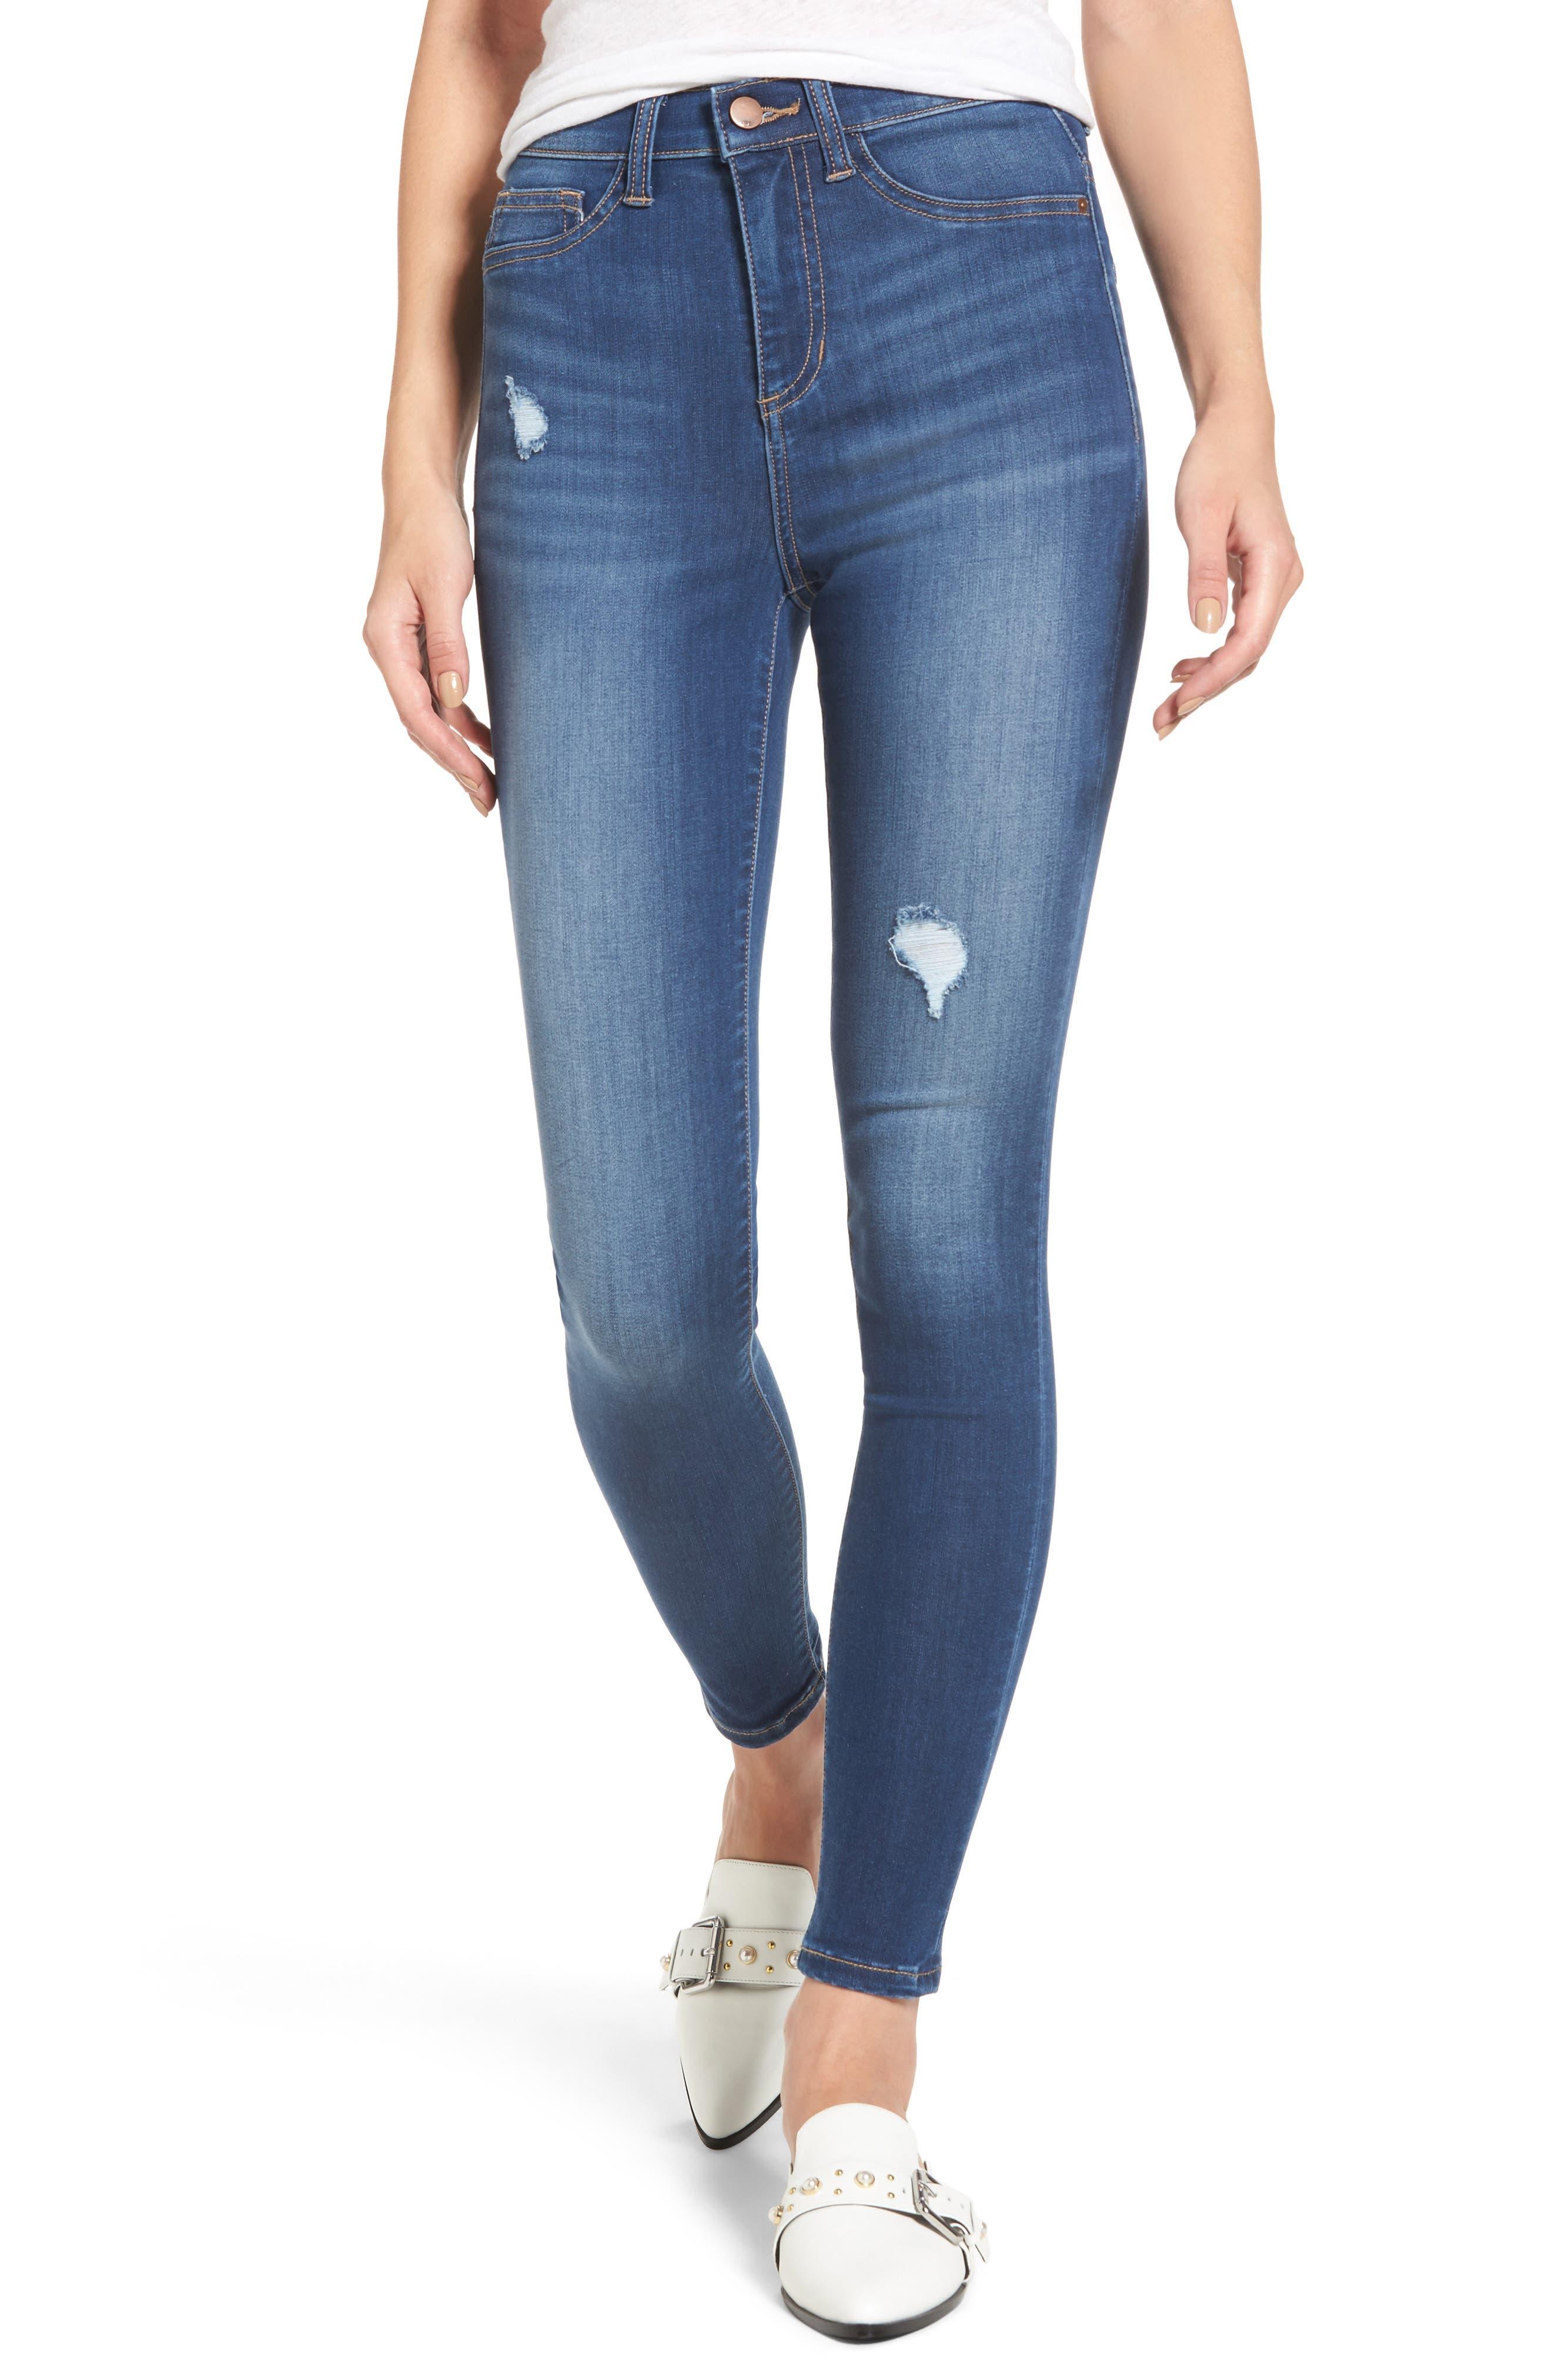 SP Black High Waist Skinny Jeans